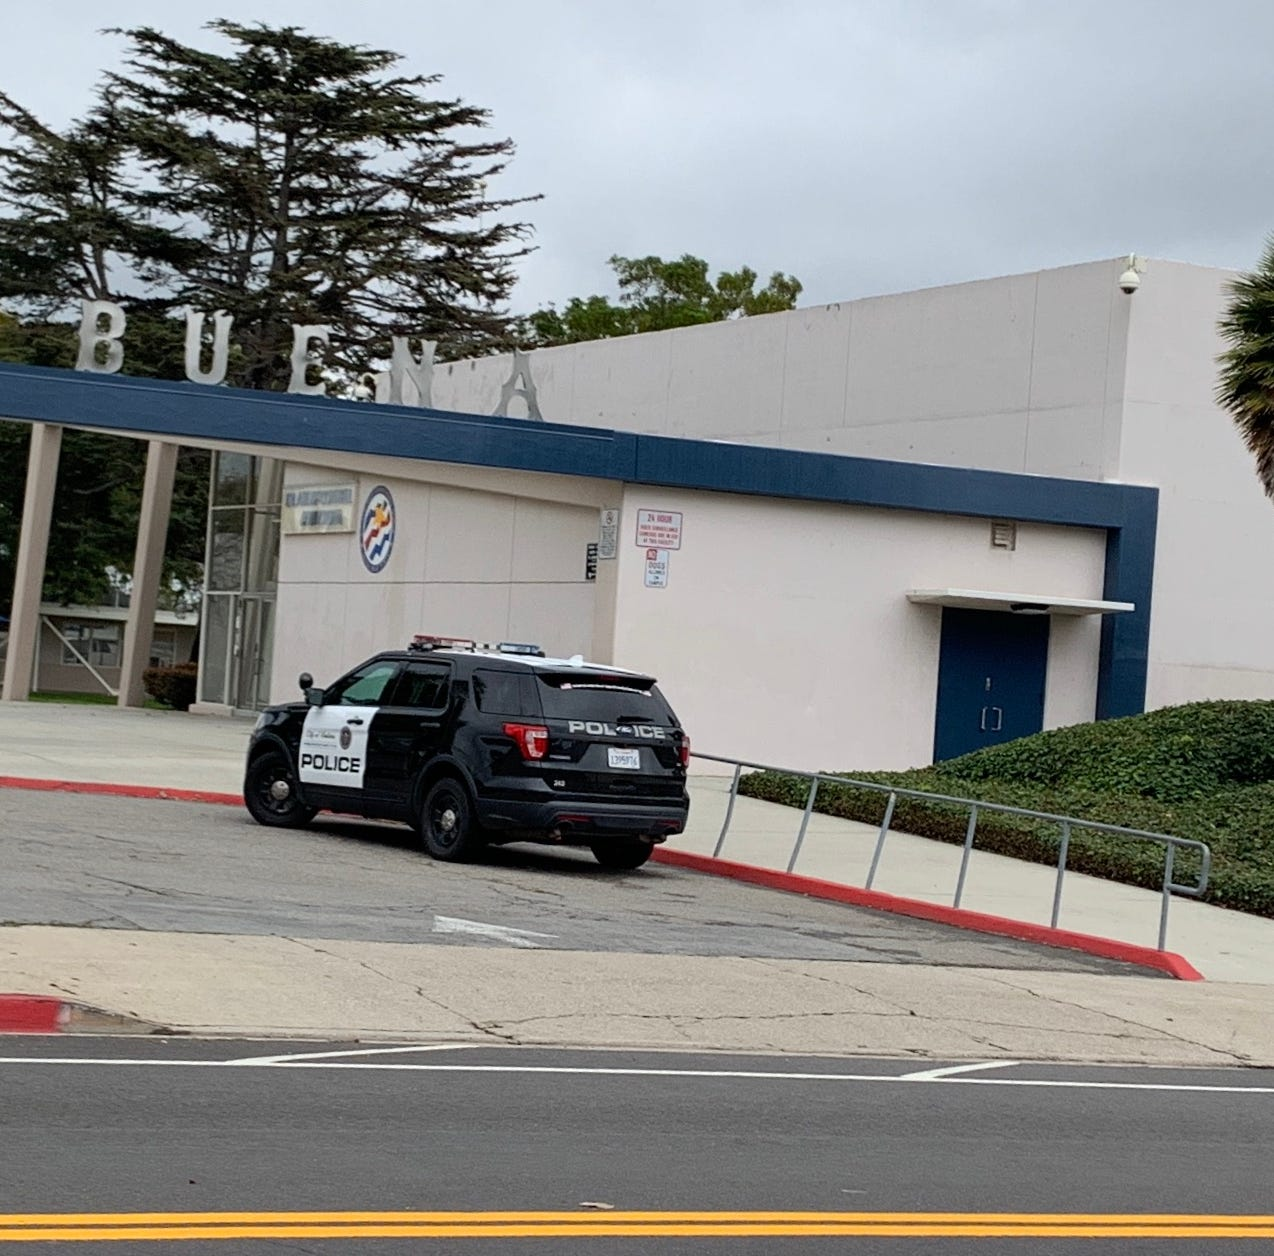 Complaint: Shorter day at Buena High creates unfair setting